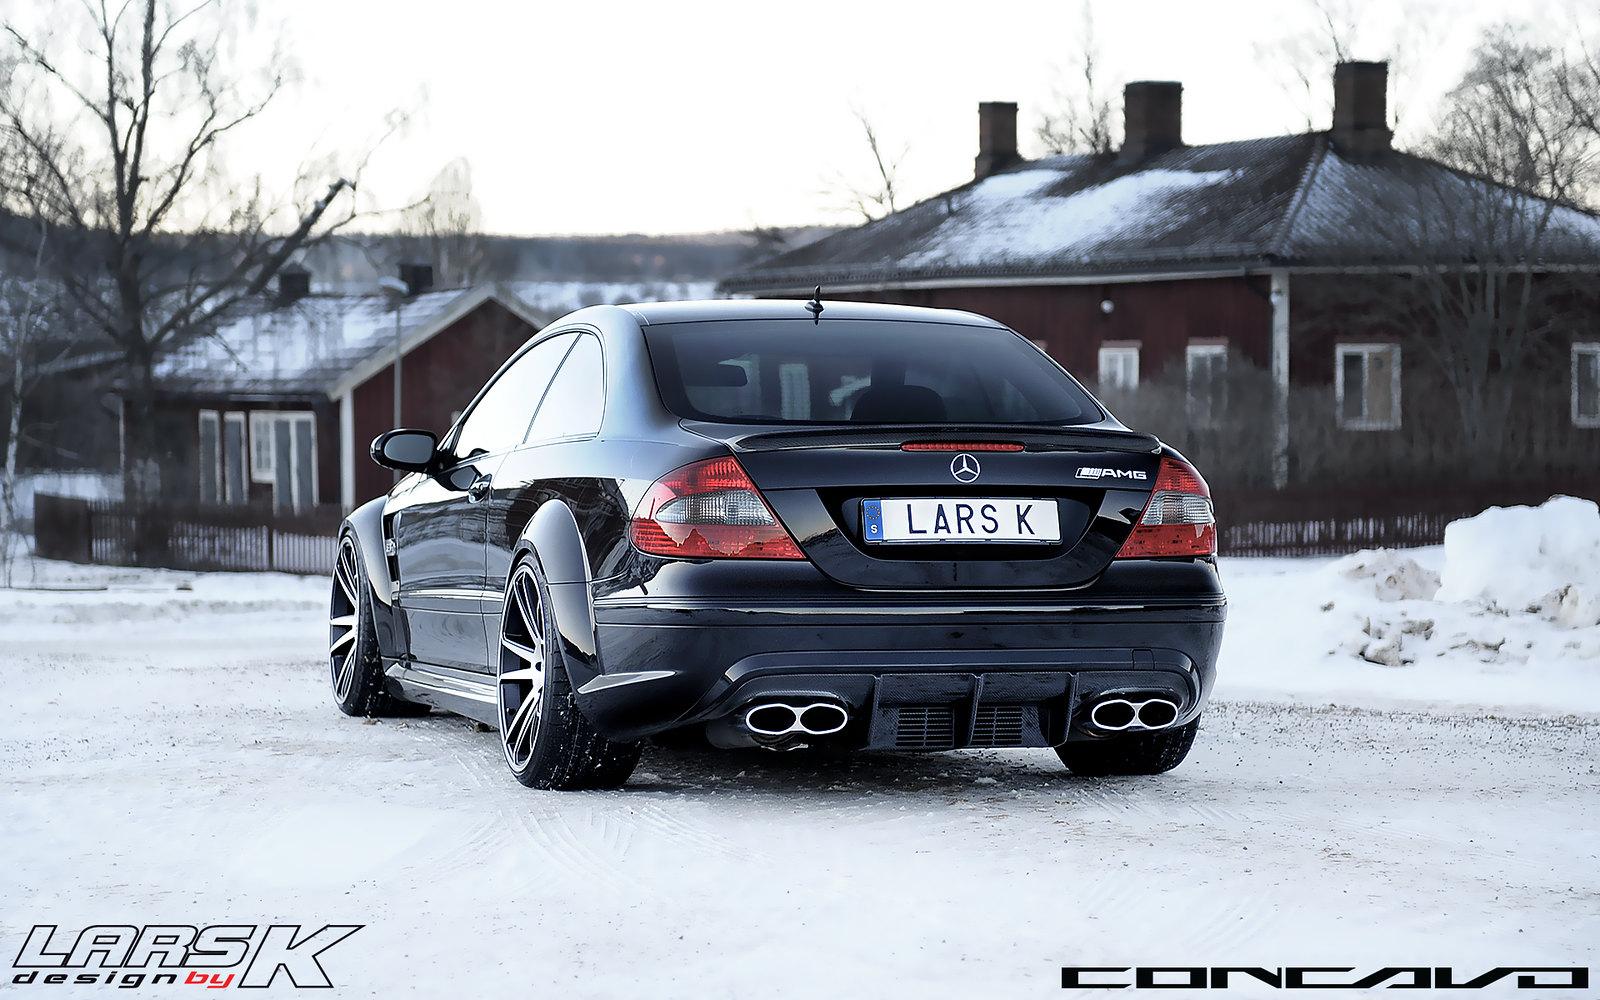 All Types amg black series wheels : CLK Black Series * AMG MADNESS - MBWorld.org Forums